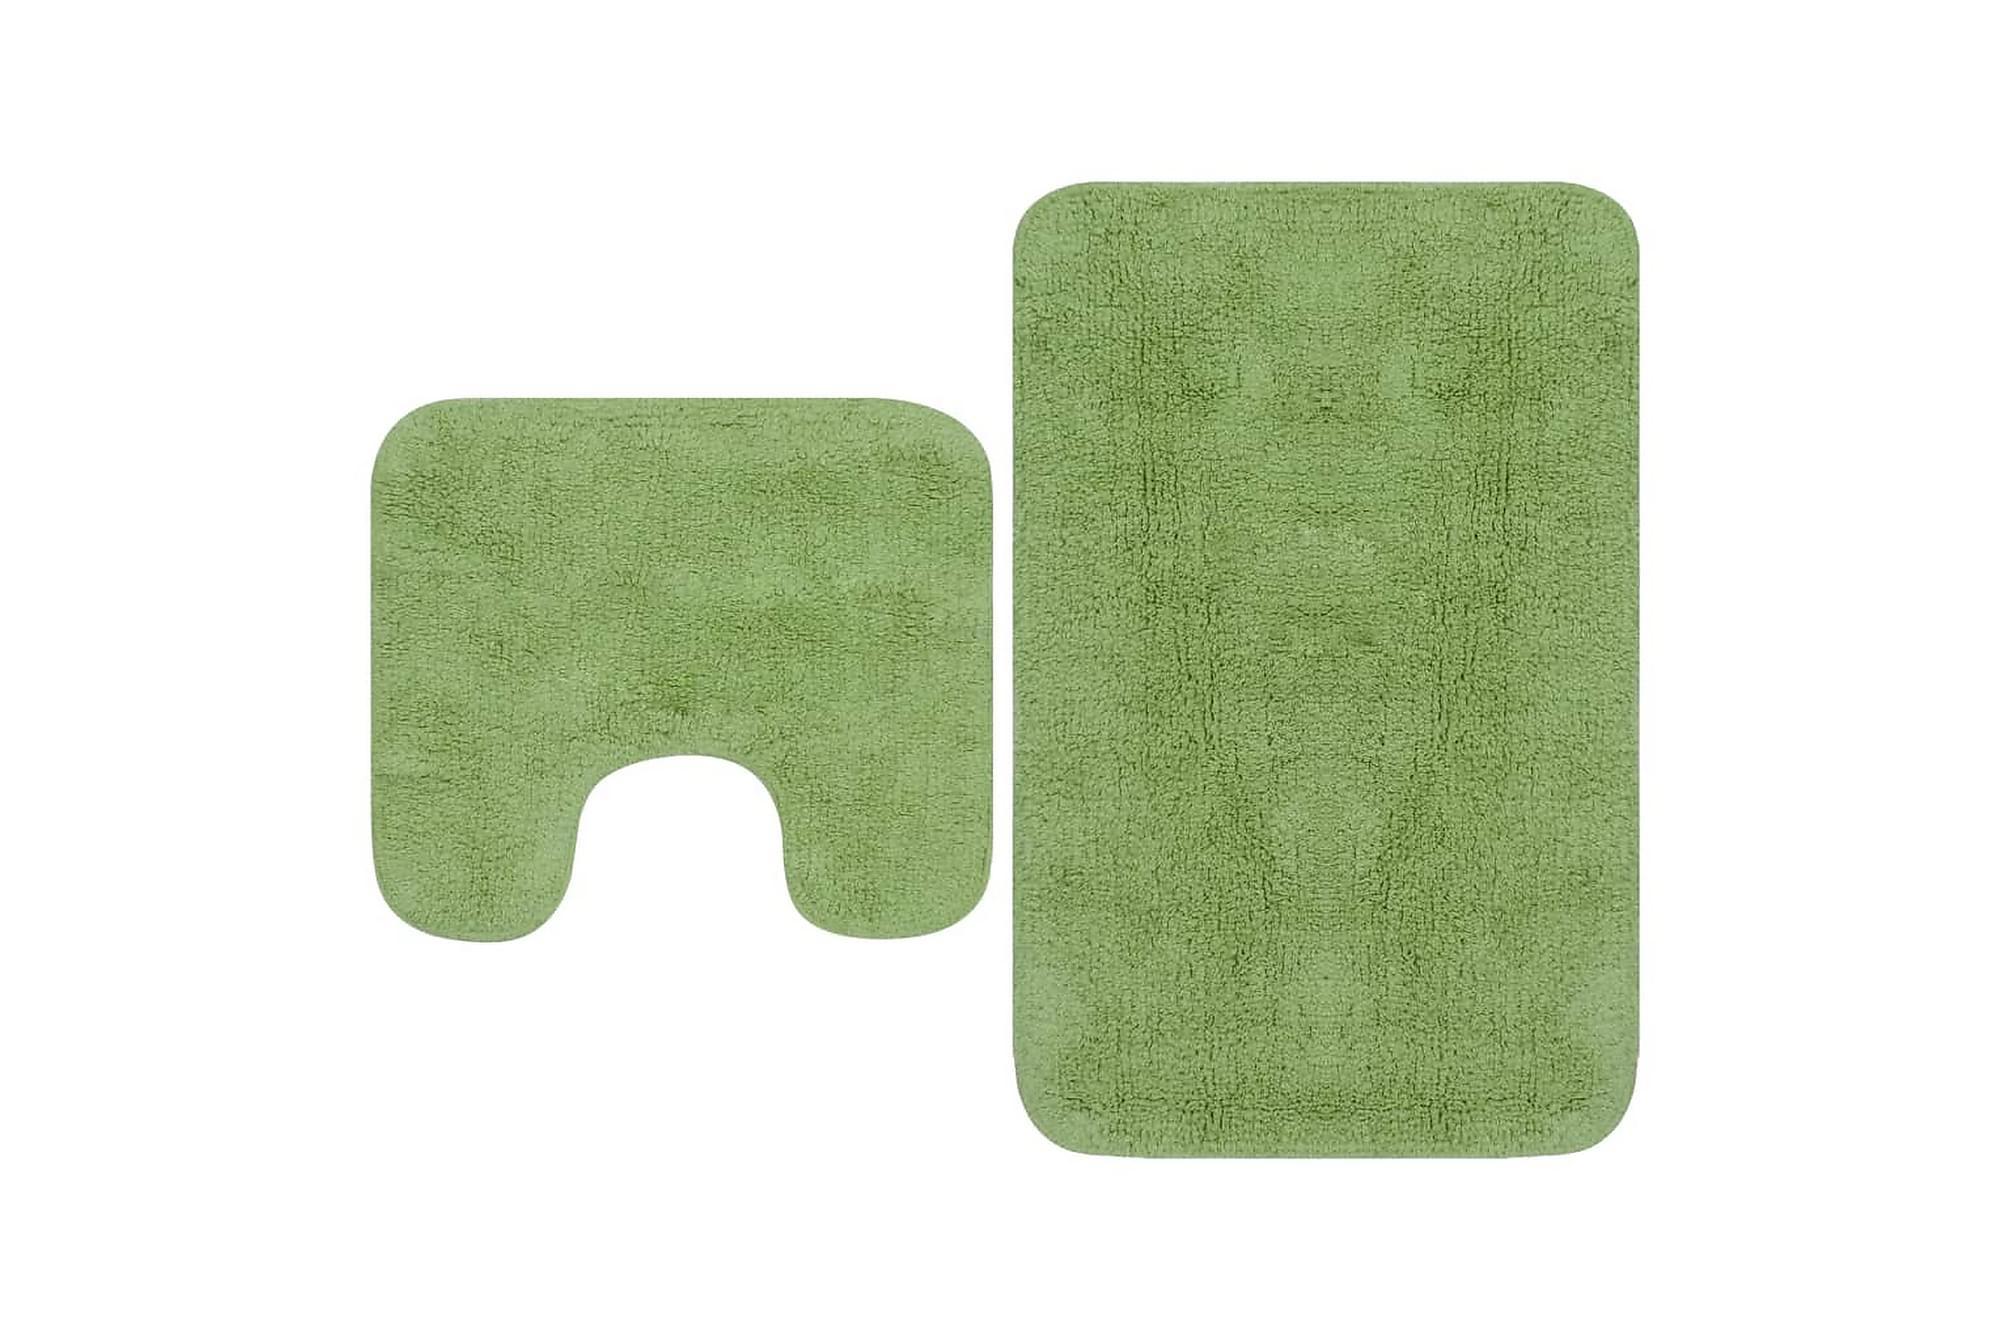 Badrumsmattor 2 st tyg grön, Badrumstillbehör